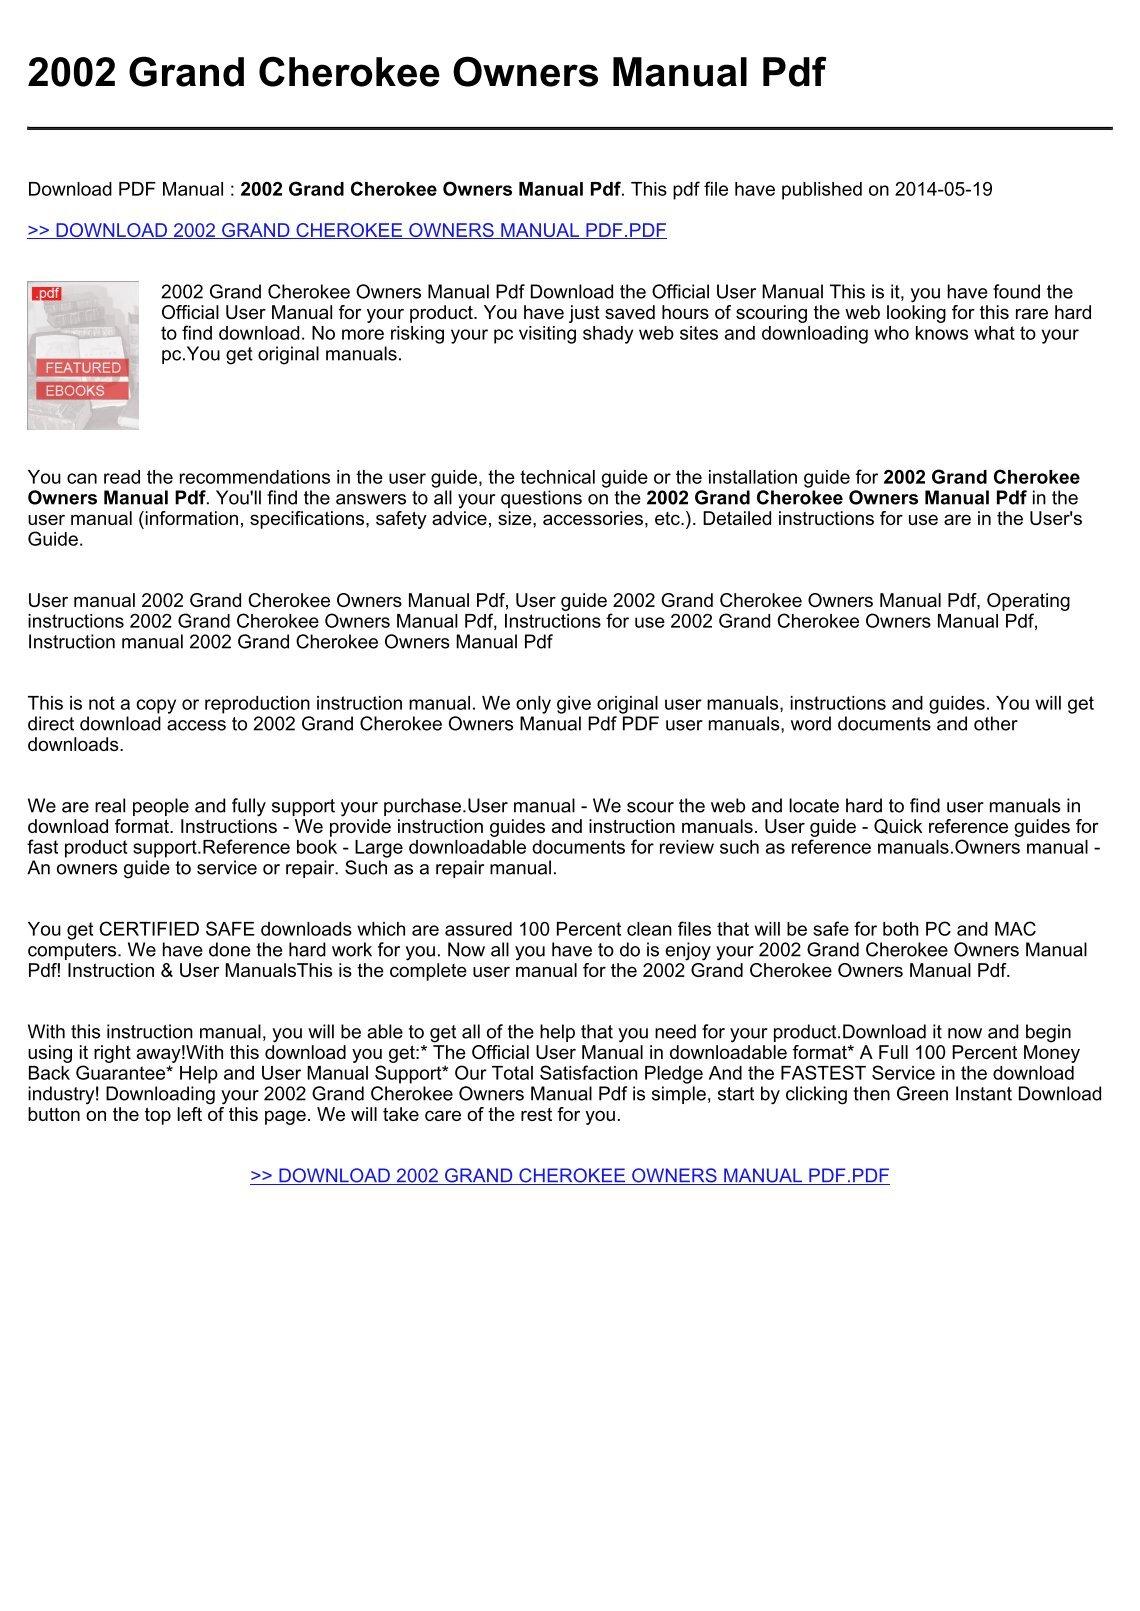 ... repair manual ebook zettadata solutions Array - firequest 200 manual rh  firequest 200 manual diestetic com